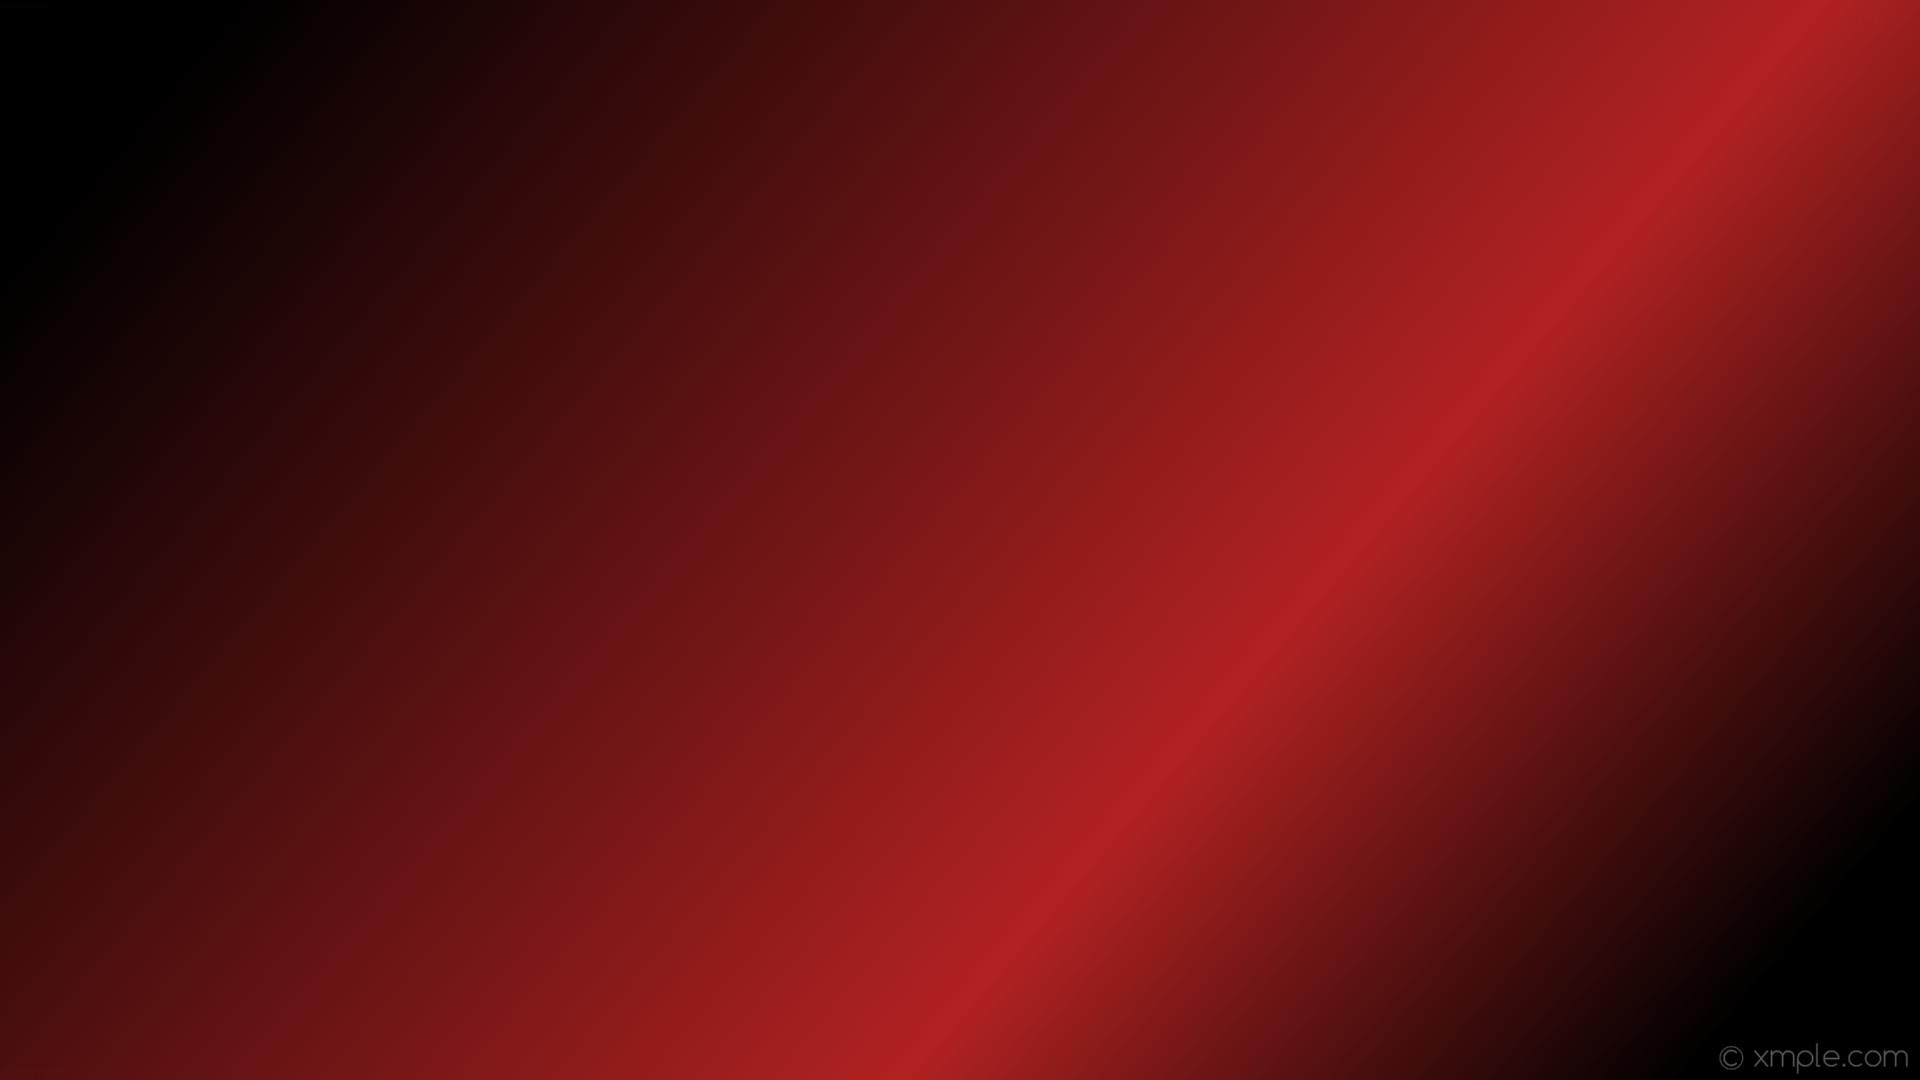 wallpaper red black highlight gradient linear fire brick #000000 #b22222  165° 67%